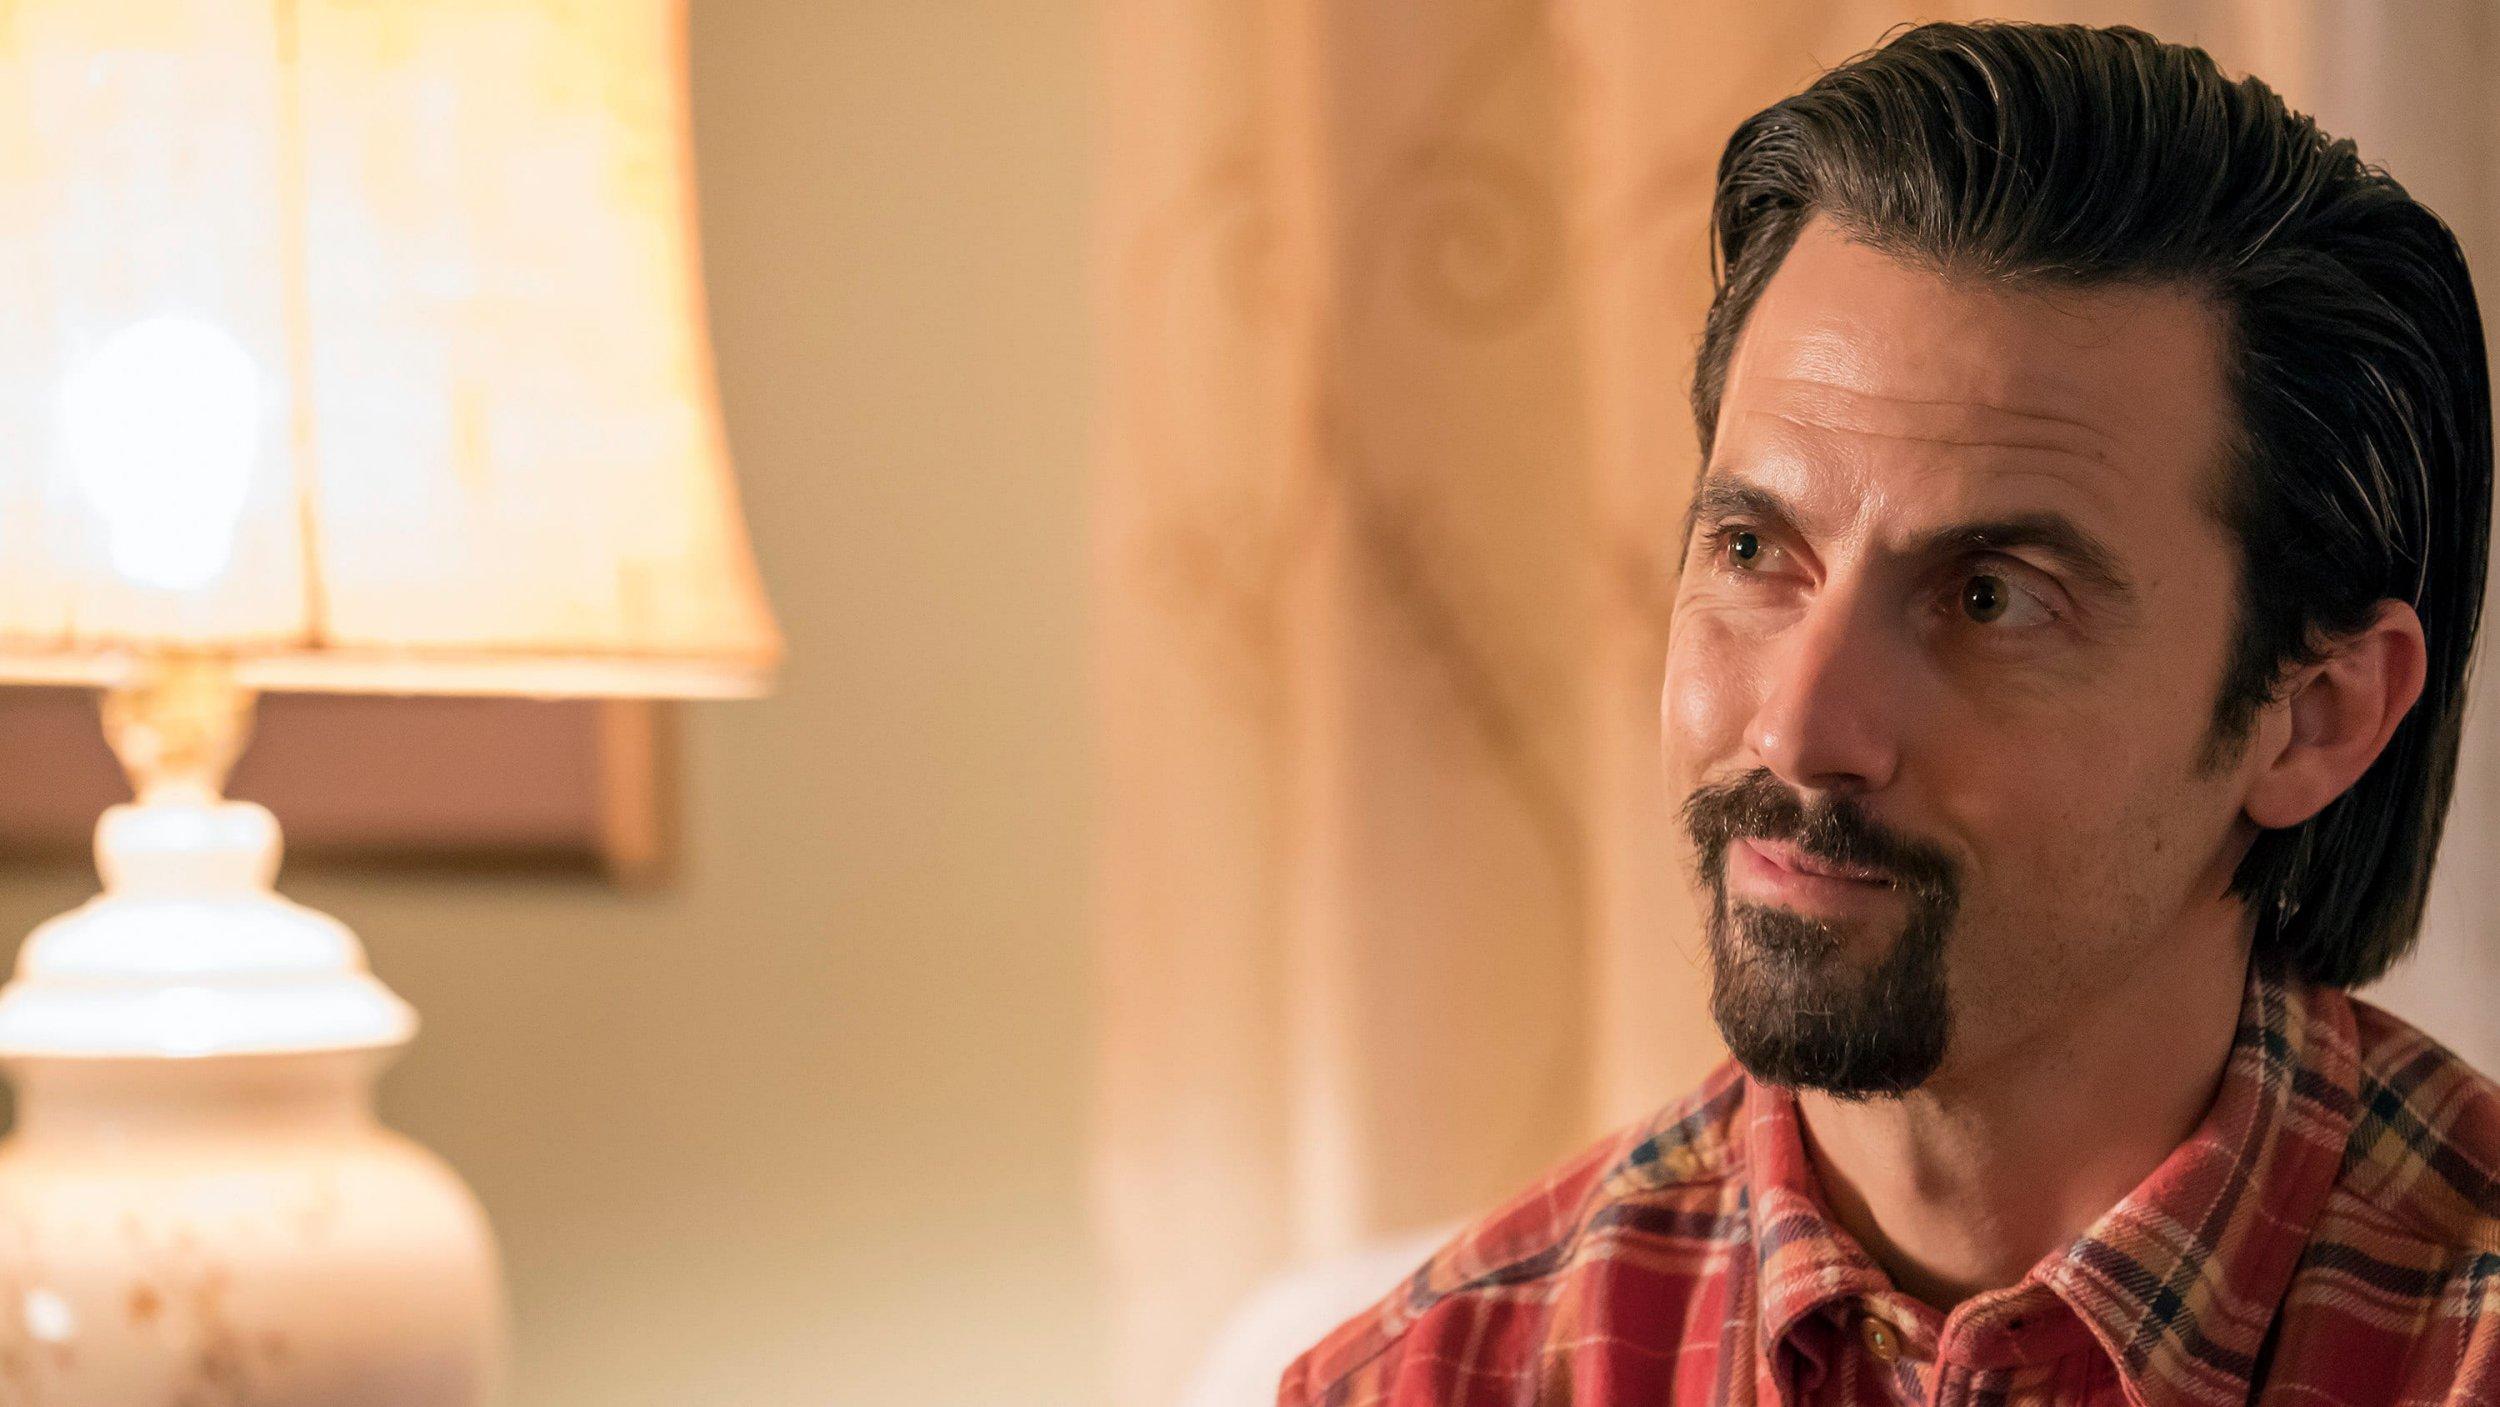 This Is Us: Milo Ventimiglia teases 'future Jack' scenes in season 3